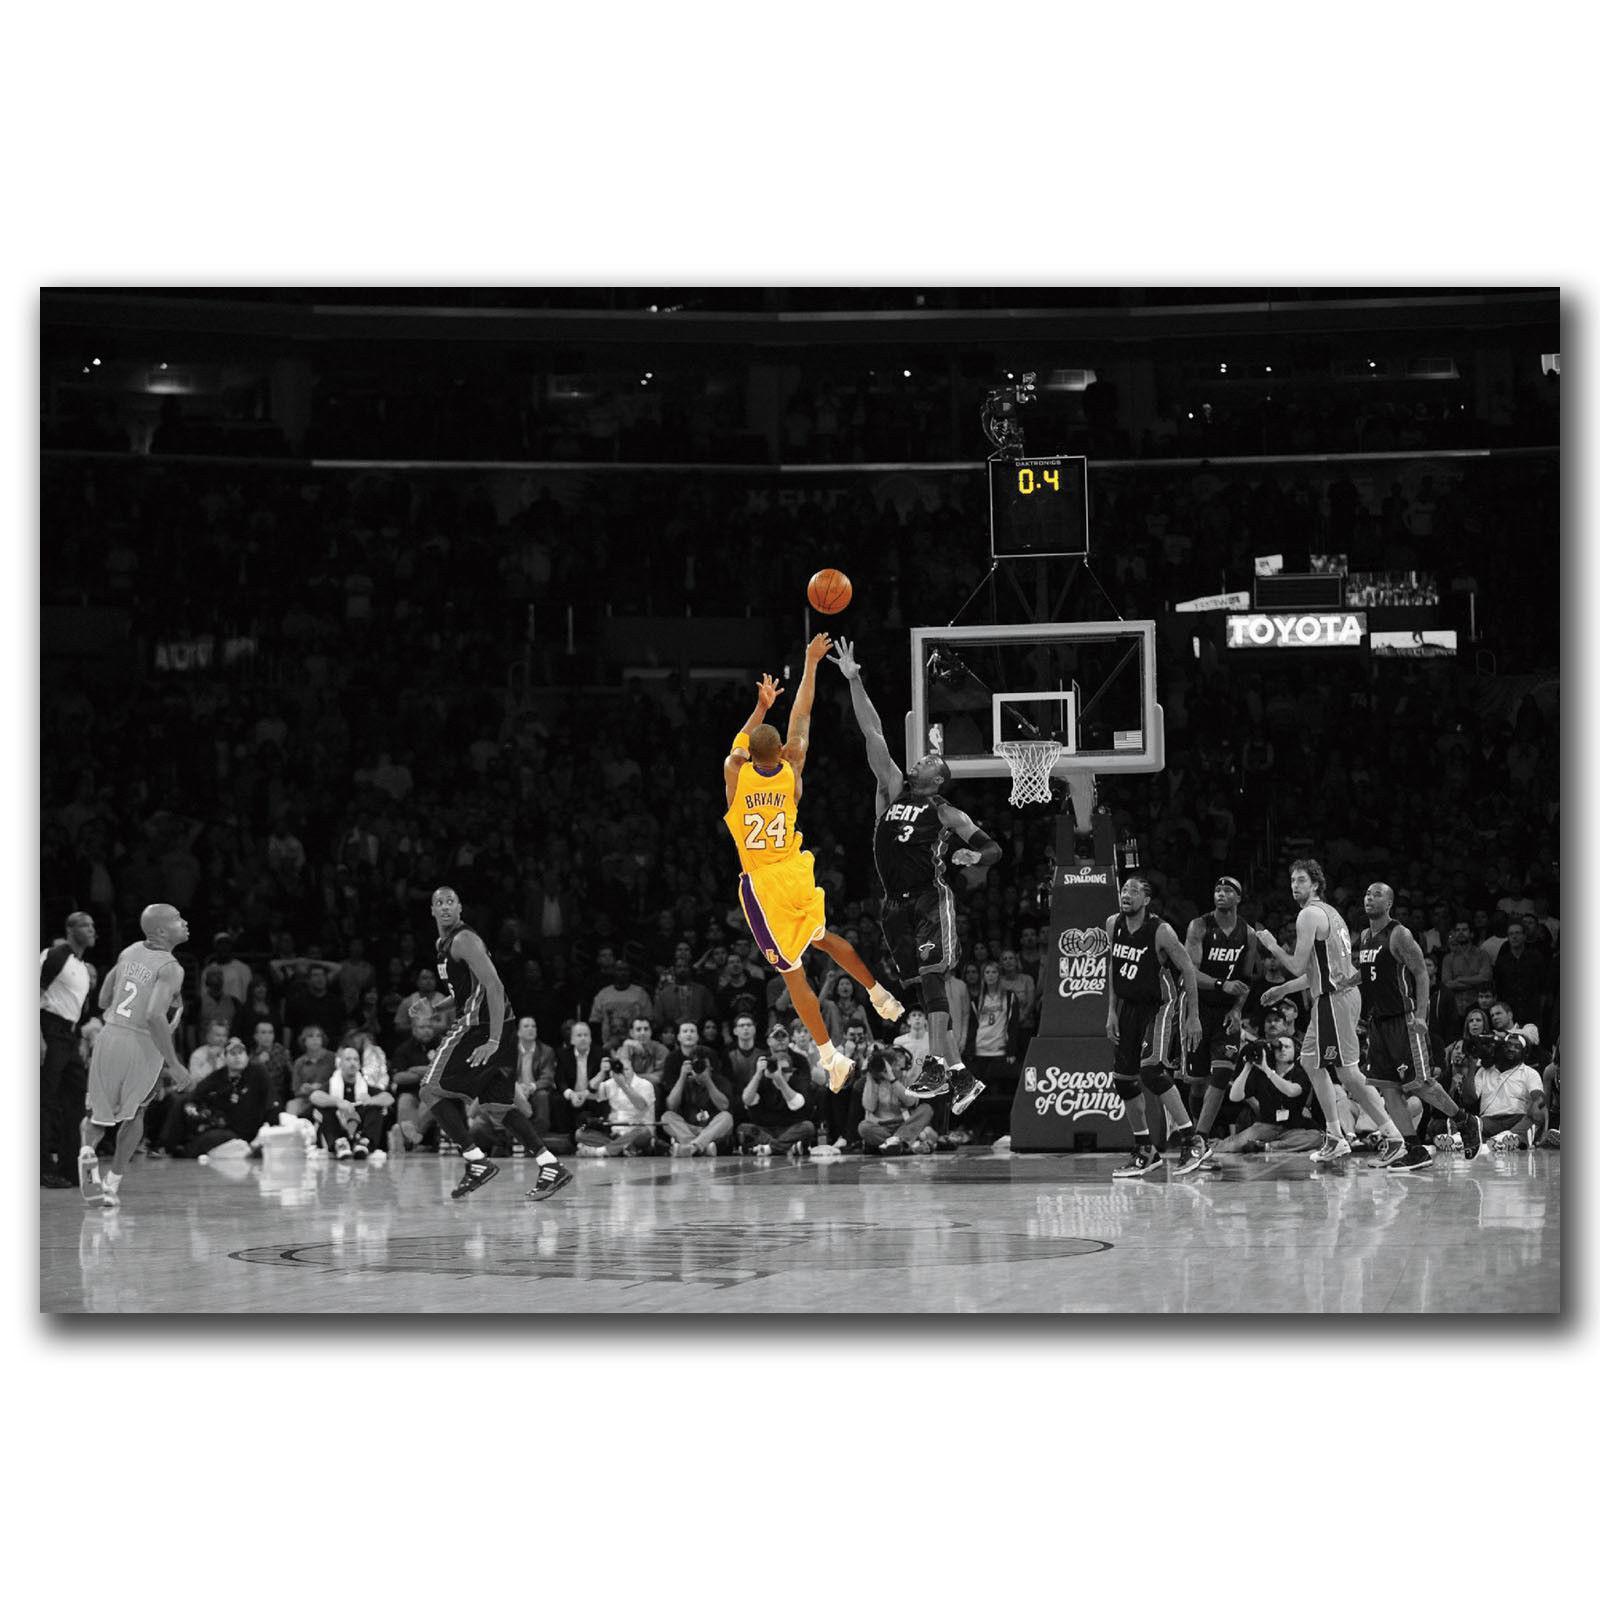 Lebron James Dunks Basketball Silk Canvas Poster 12x18 24x36 inch Wall Art